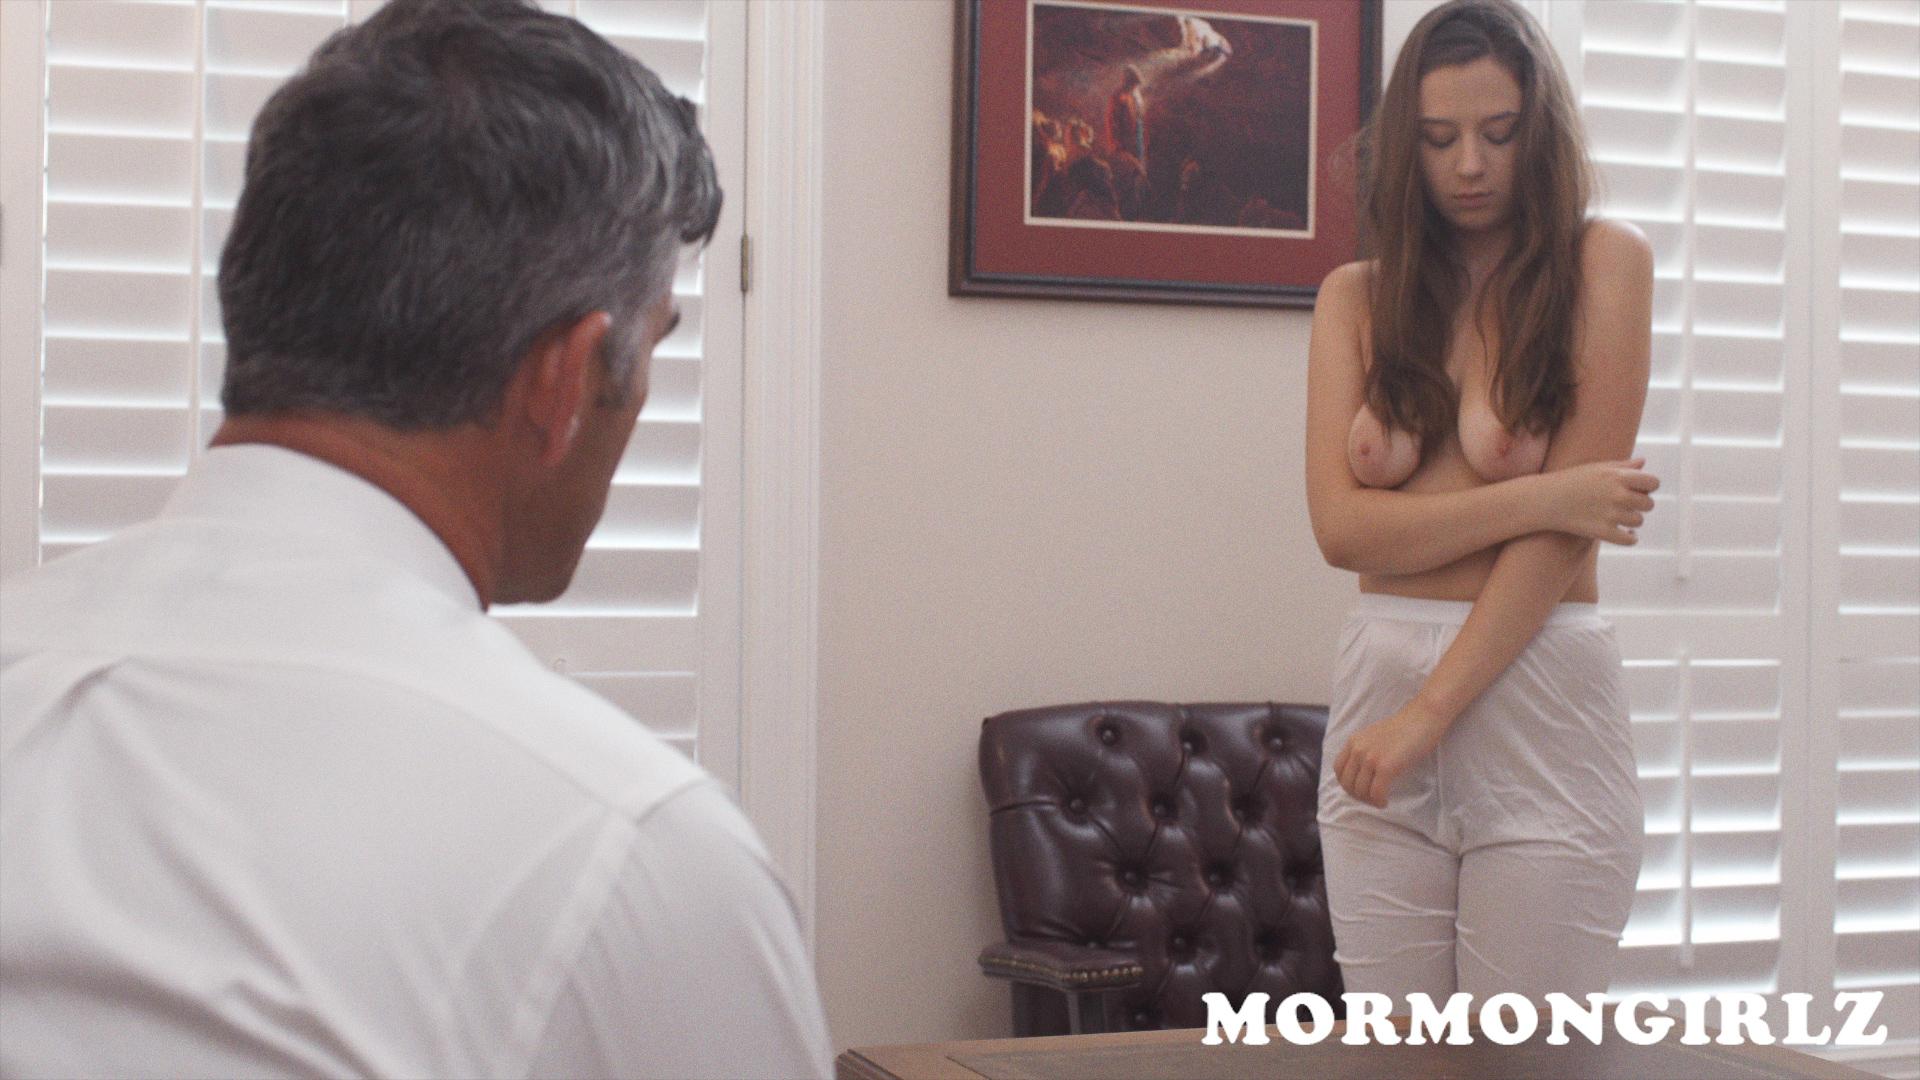 MORMON PORN MOVIES GAY LINGERIE SEX VIDEOS